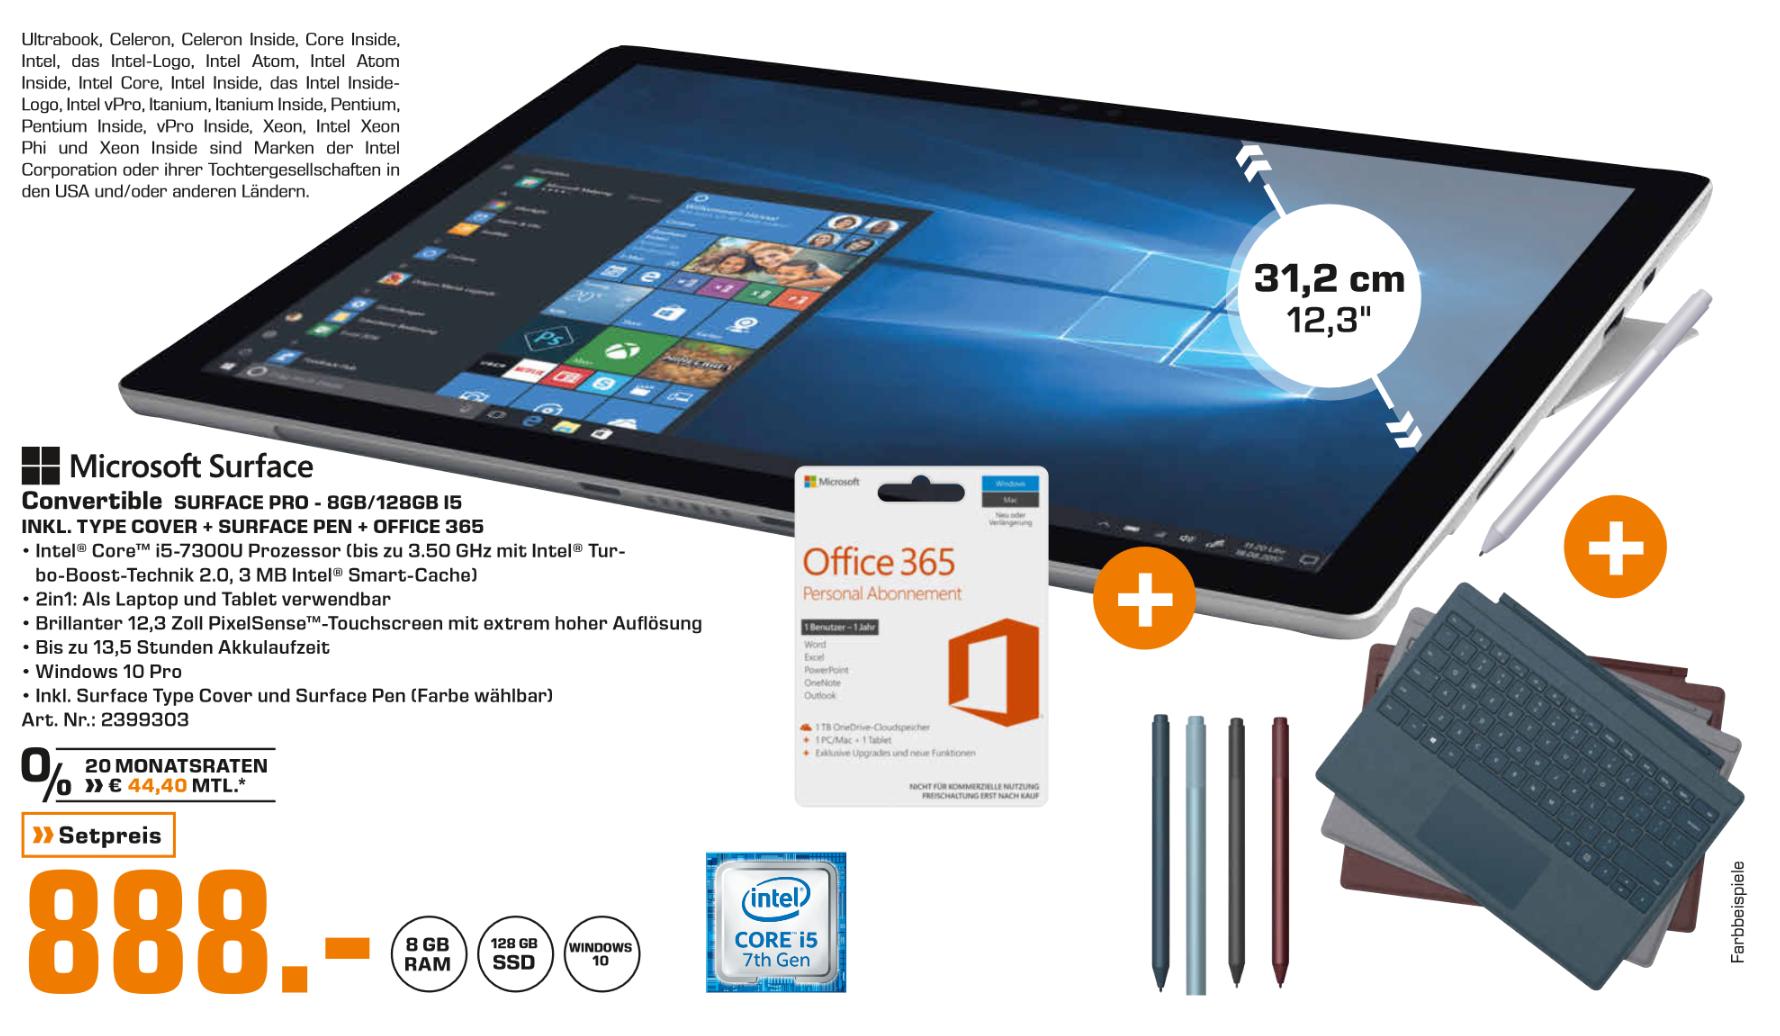 (Saturn Hamburg Mönckebergstr.) Surface Pro i5 8GB 128GB + Typecover + Pen + Office 365